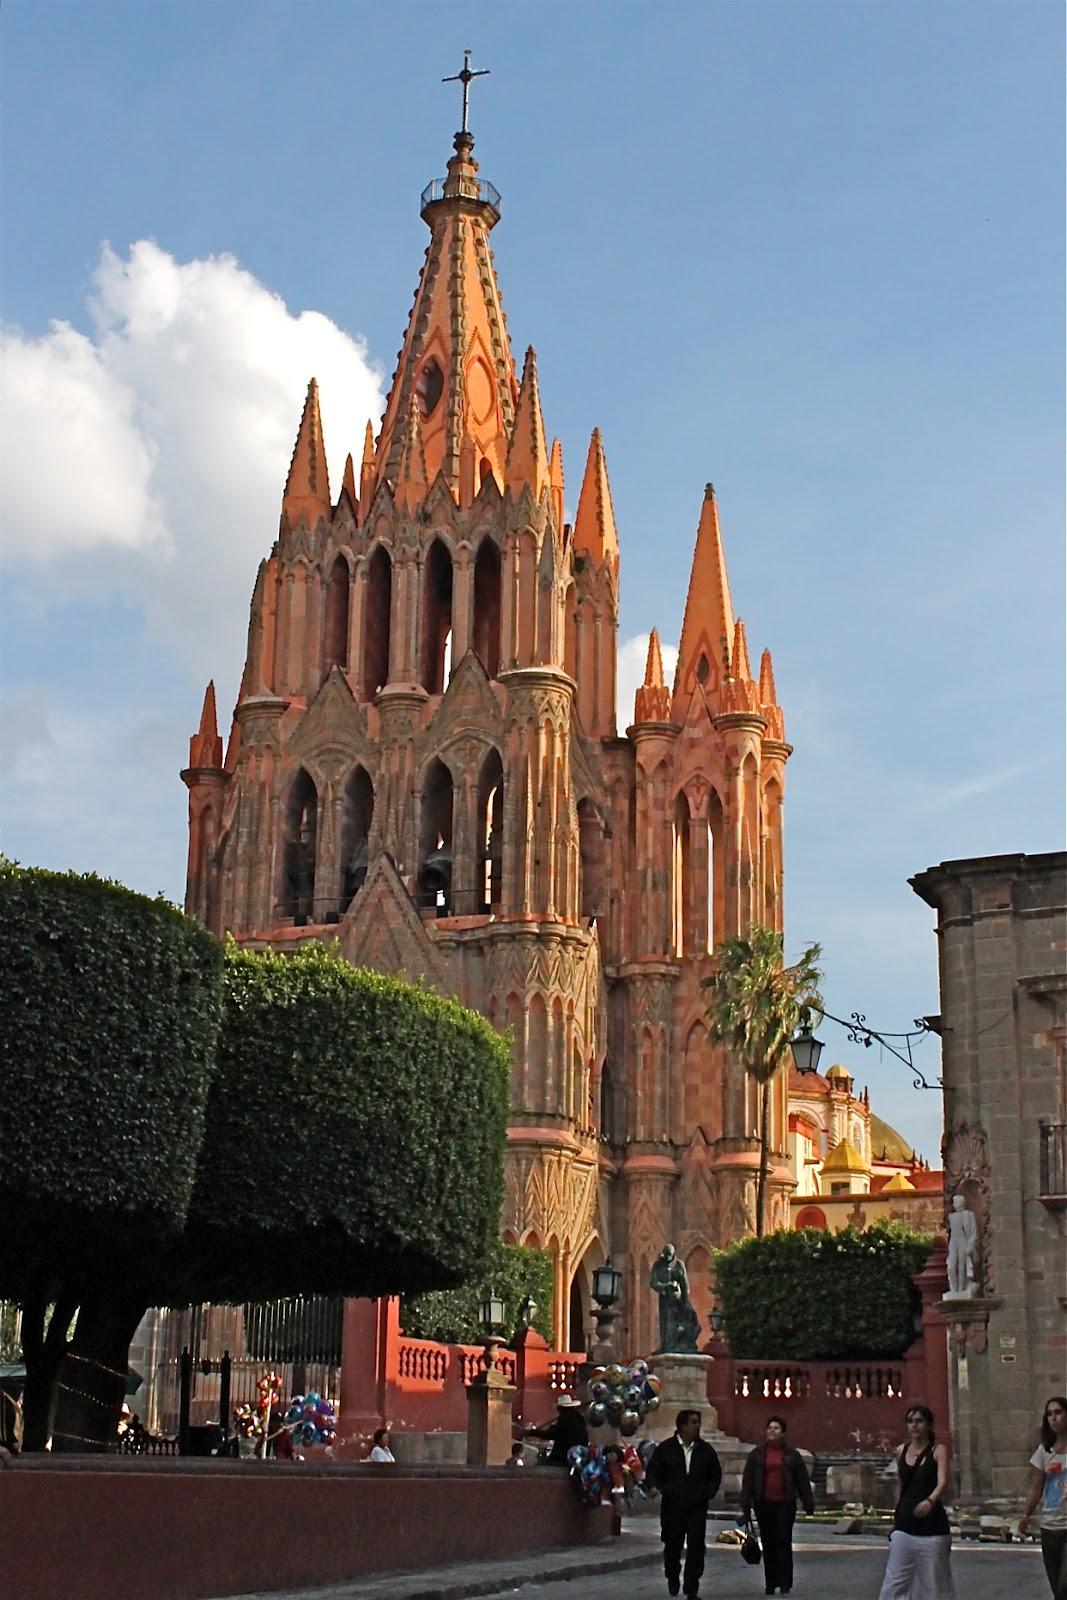 The magnificent Parroquia of San Miguel Archangel